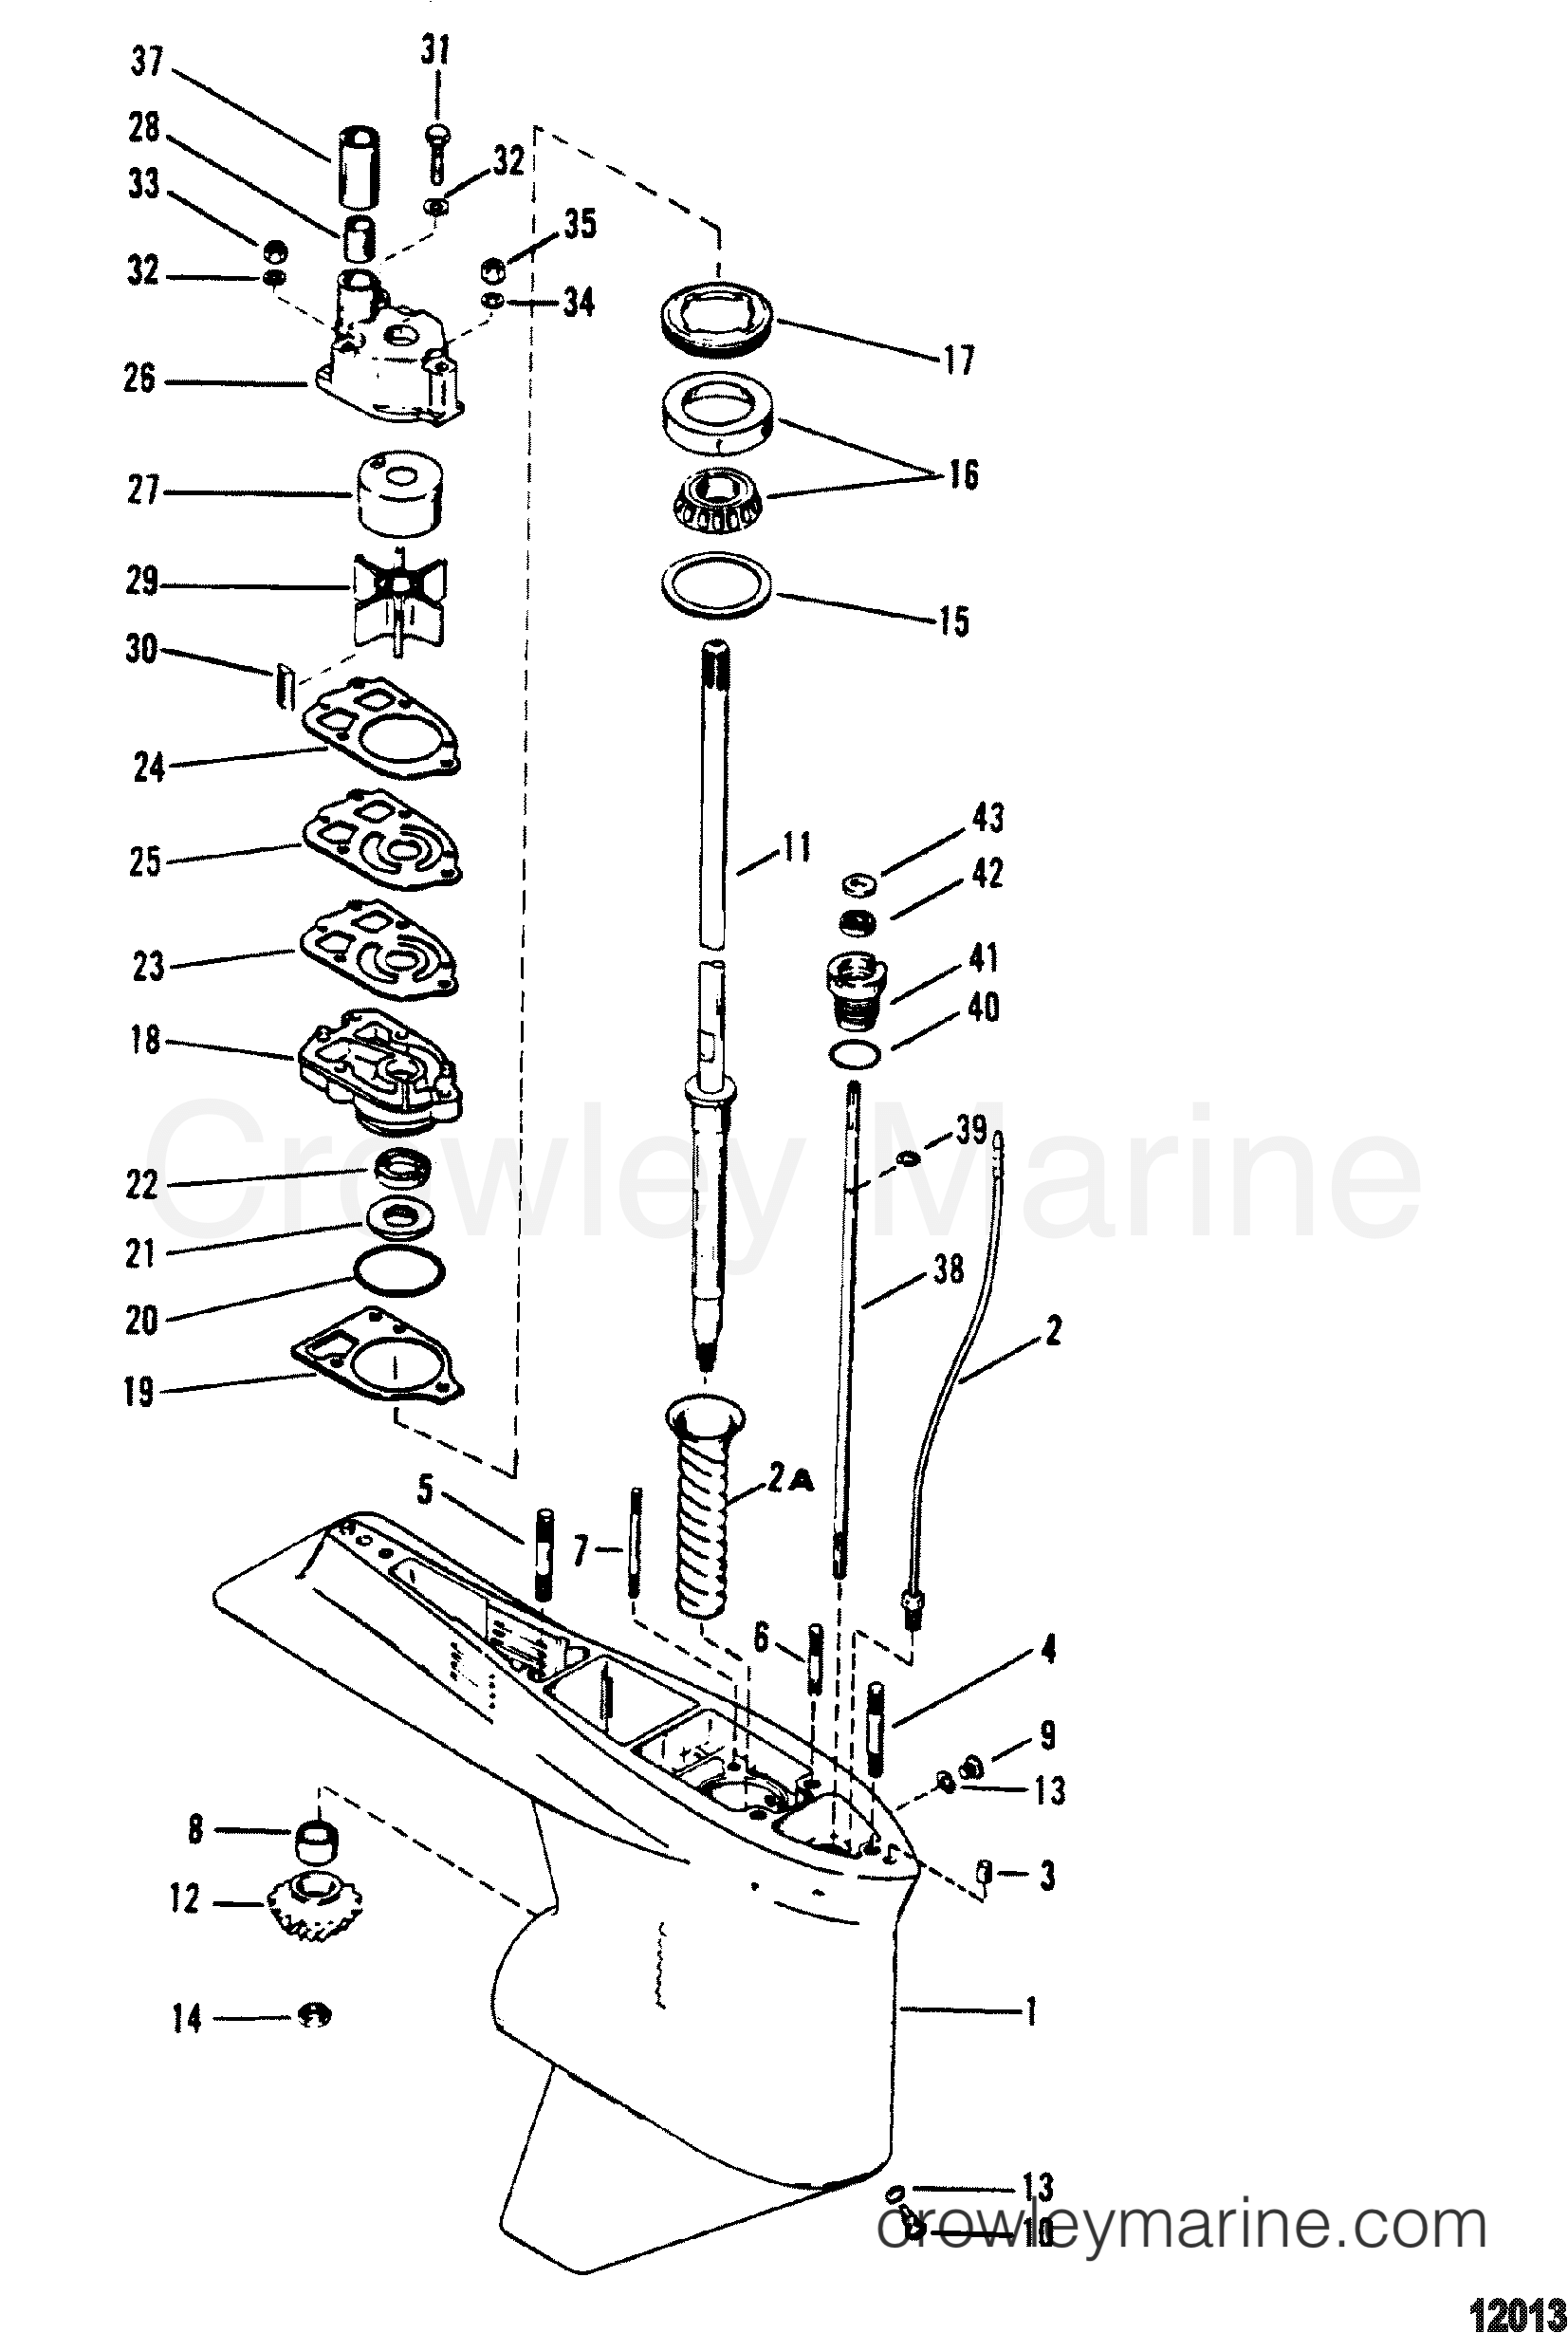 1994 Mercury Outboard 175 [XL] - 1175422PD - GEAR HSG(DRIVESHAFT)(XR6/MAG III - 1.78:1 RATIO) section